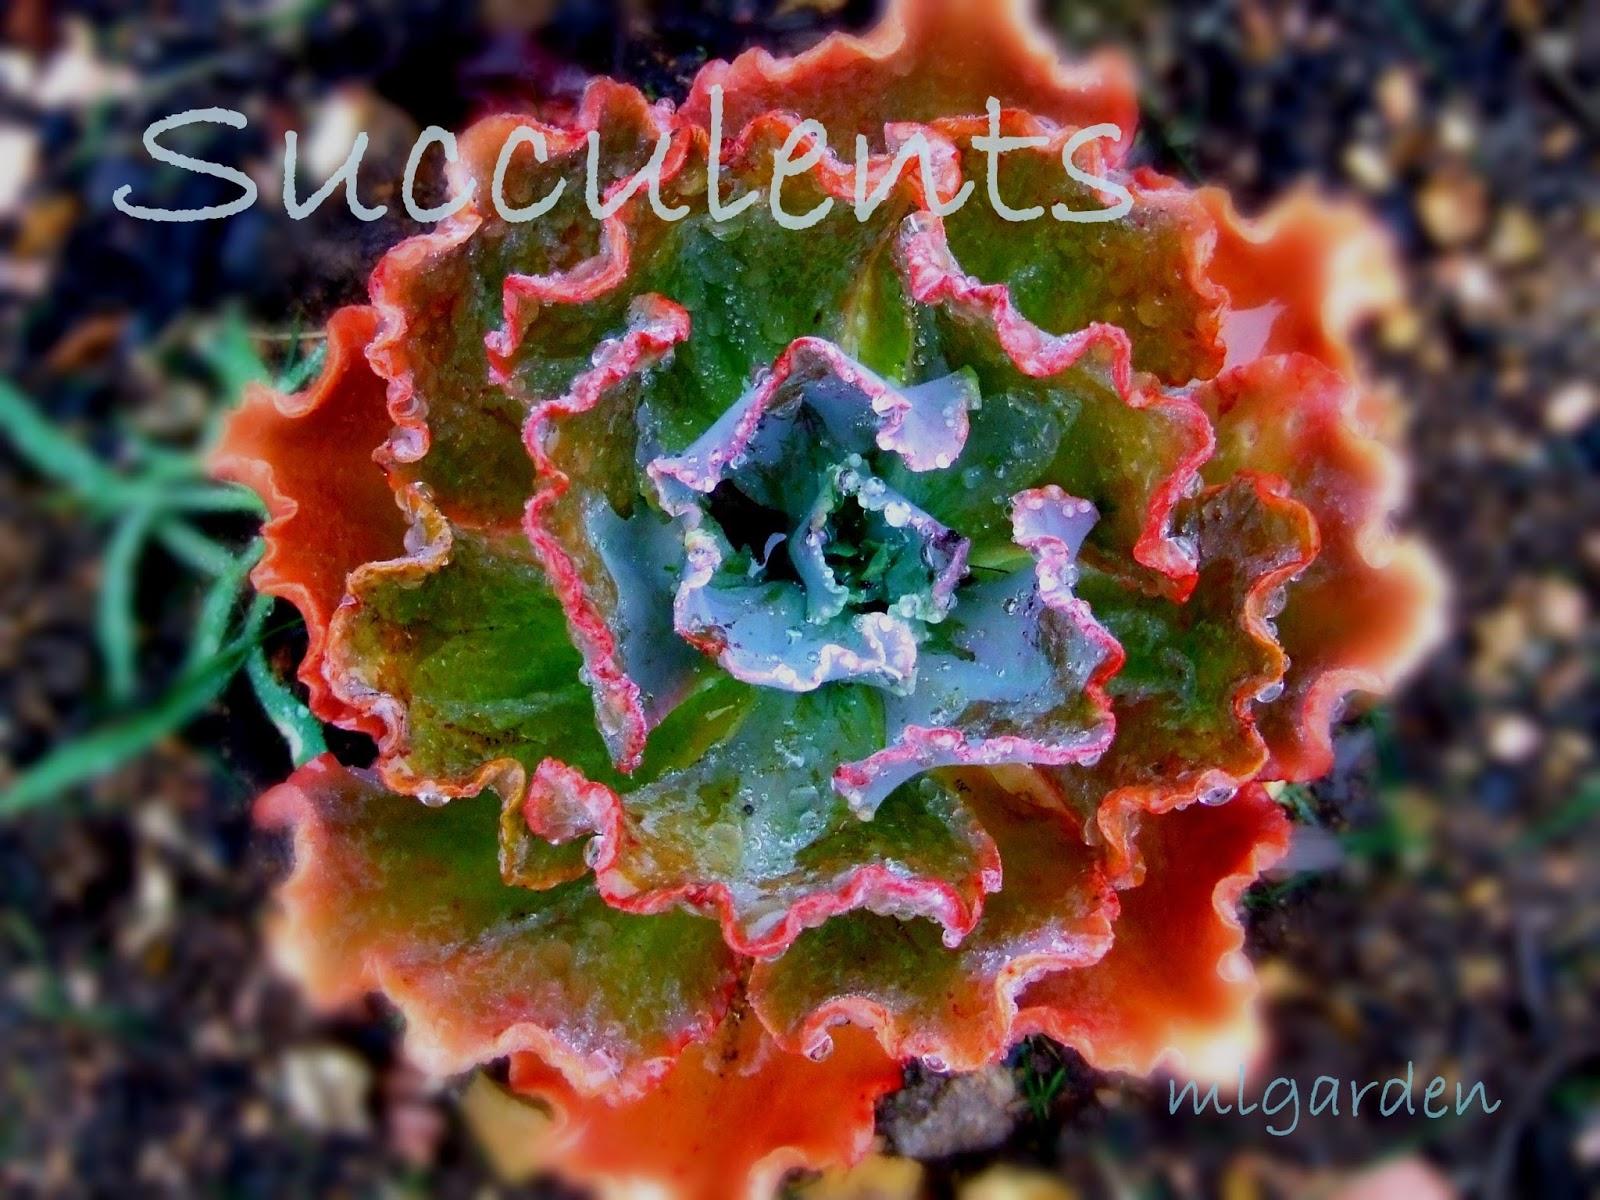 Garden Design Ideas: Sucessful Succulent Gardening on garden designs zone 6, garden designs zone 3, garden designs zone 7,